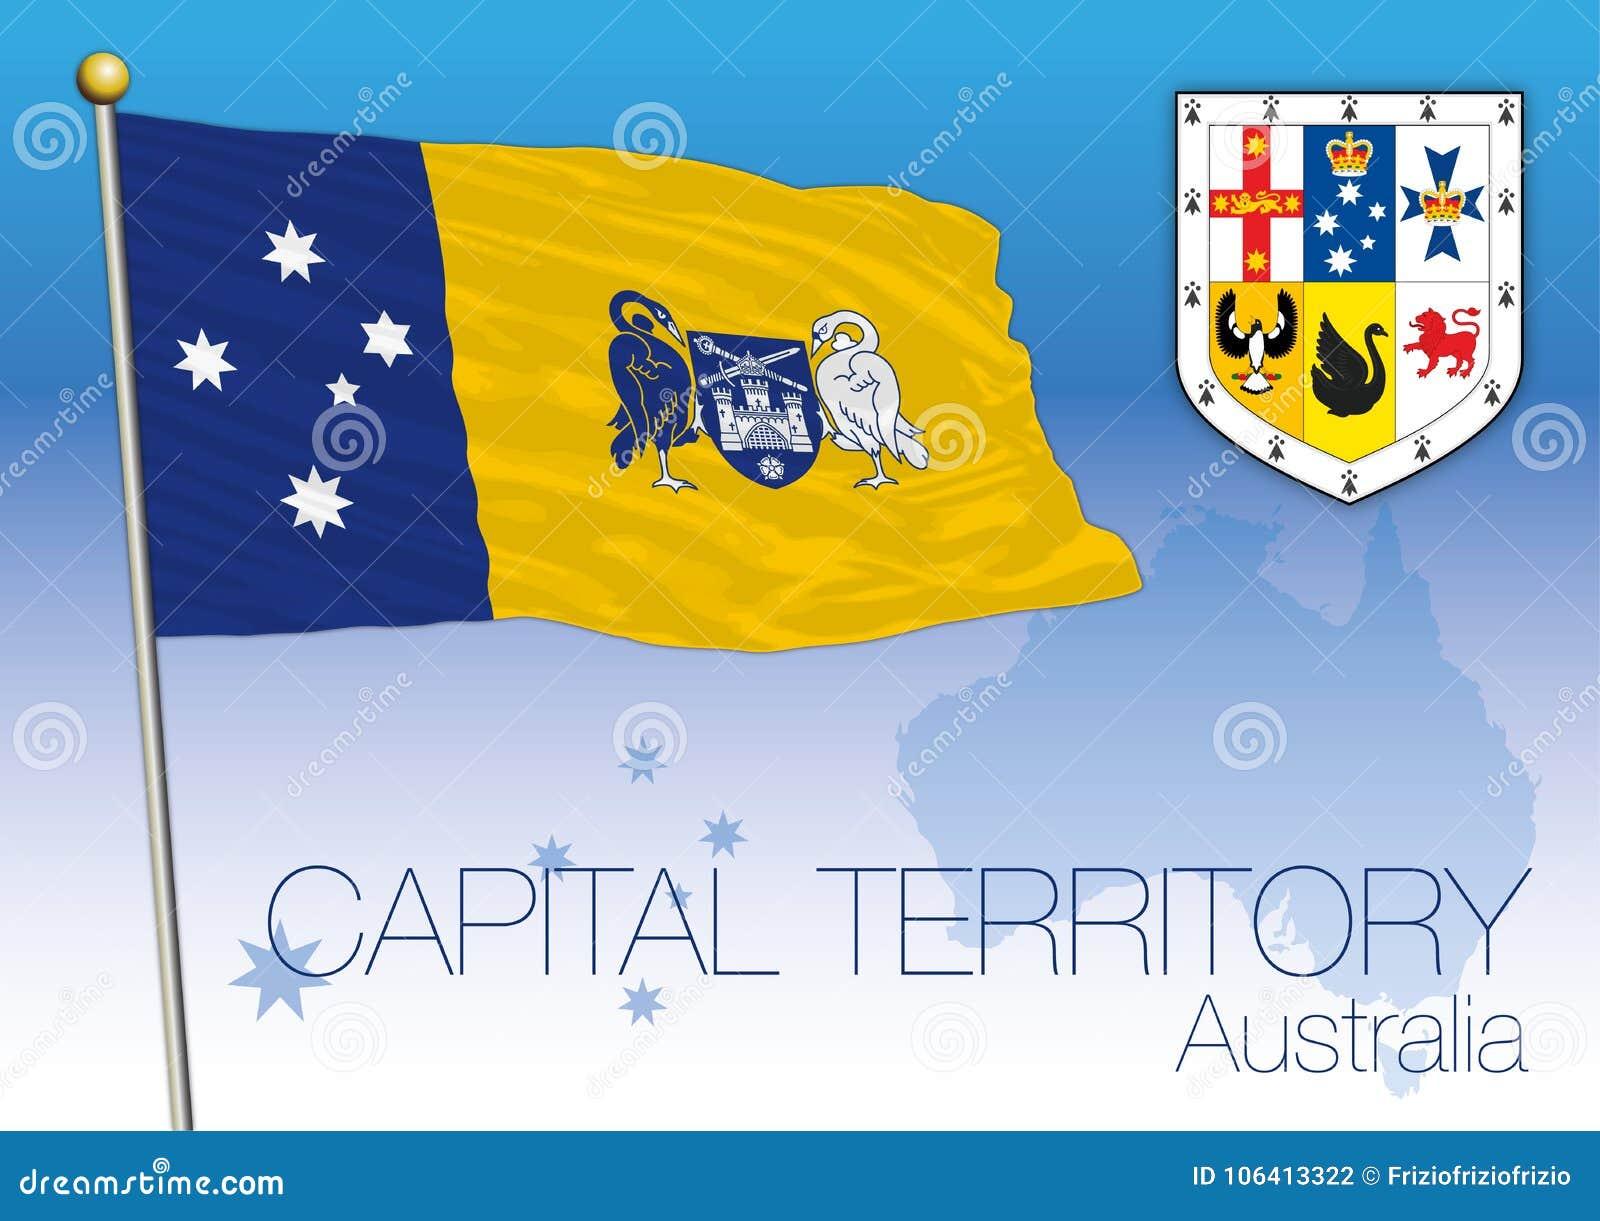 Capital Territory, flag of the state, Australia